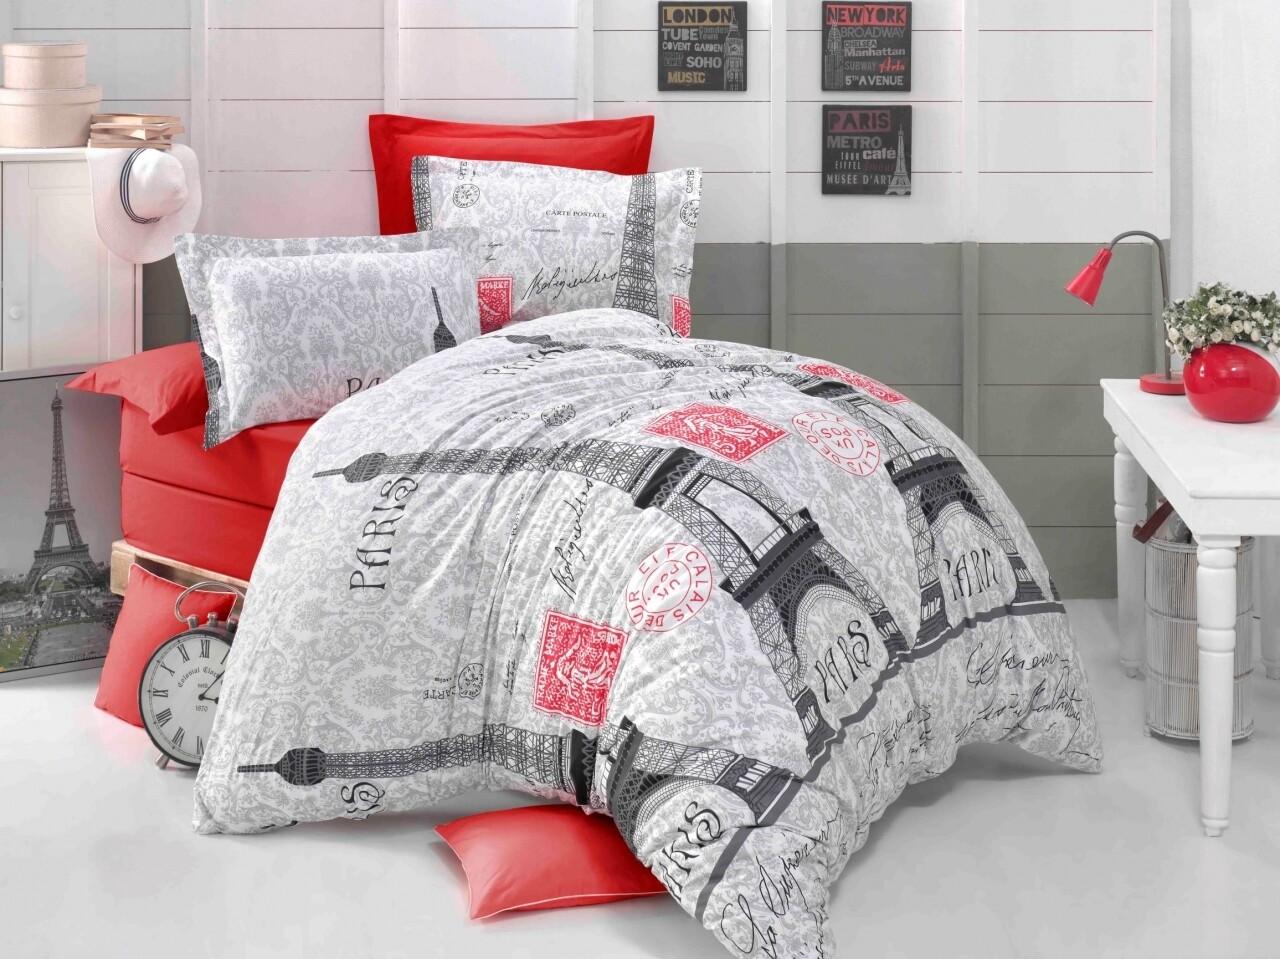 Lenjerie de pat pentru doua persoane, Paris Noir Bedora, 100%  bumbac, 6 piese